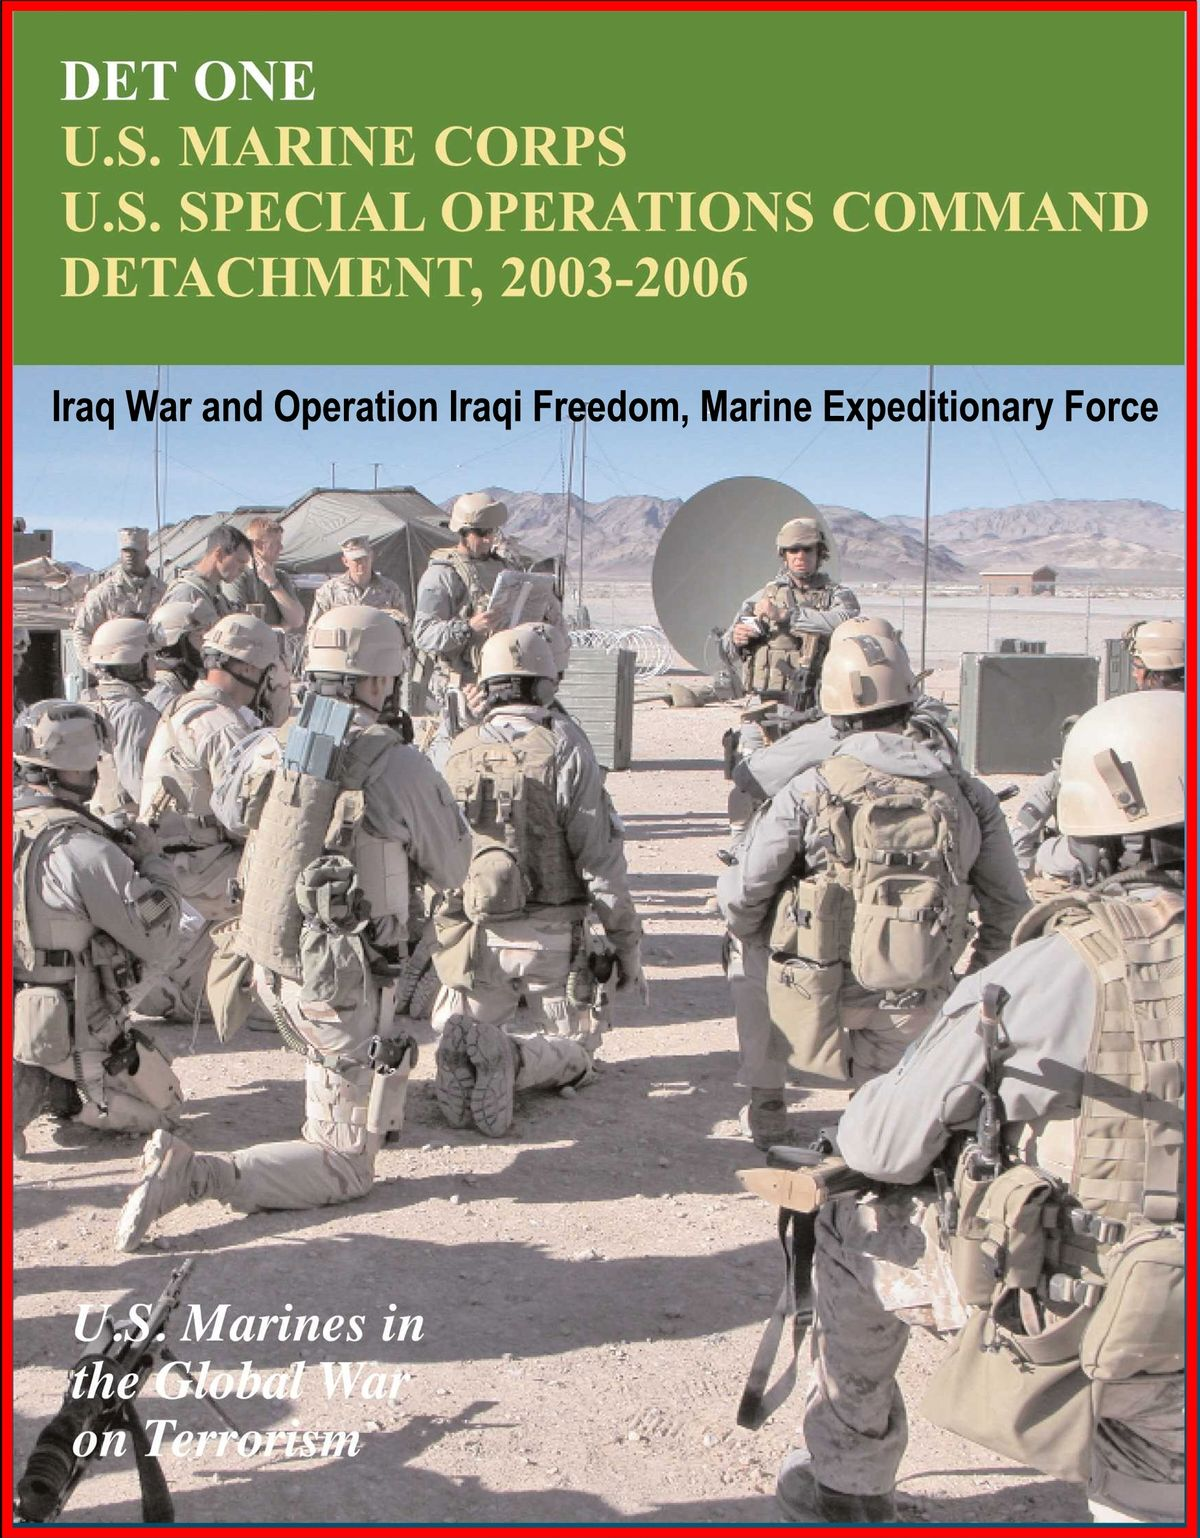 Det One: U S  Marines Corps U S  Special Operations Command Detachment  2003-2006 - Global War on Terrorism, Iraq War and Operation Iraqi Freedom,